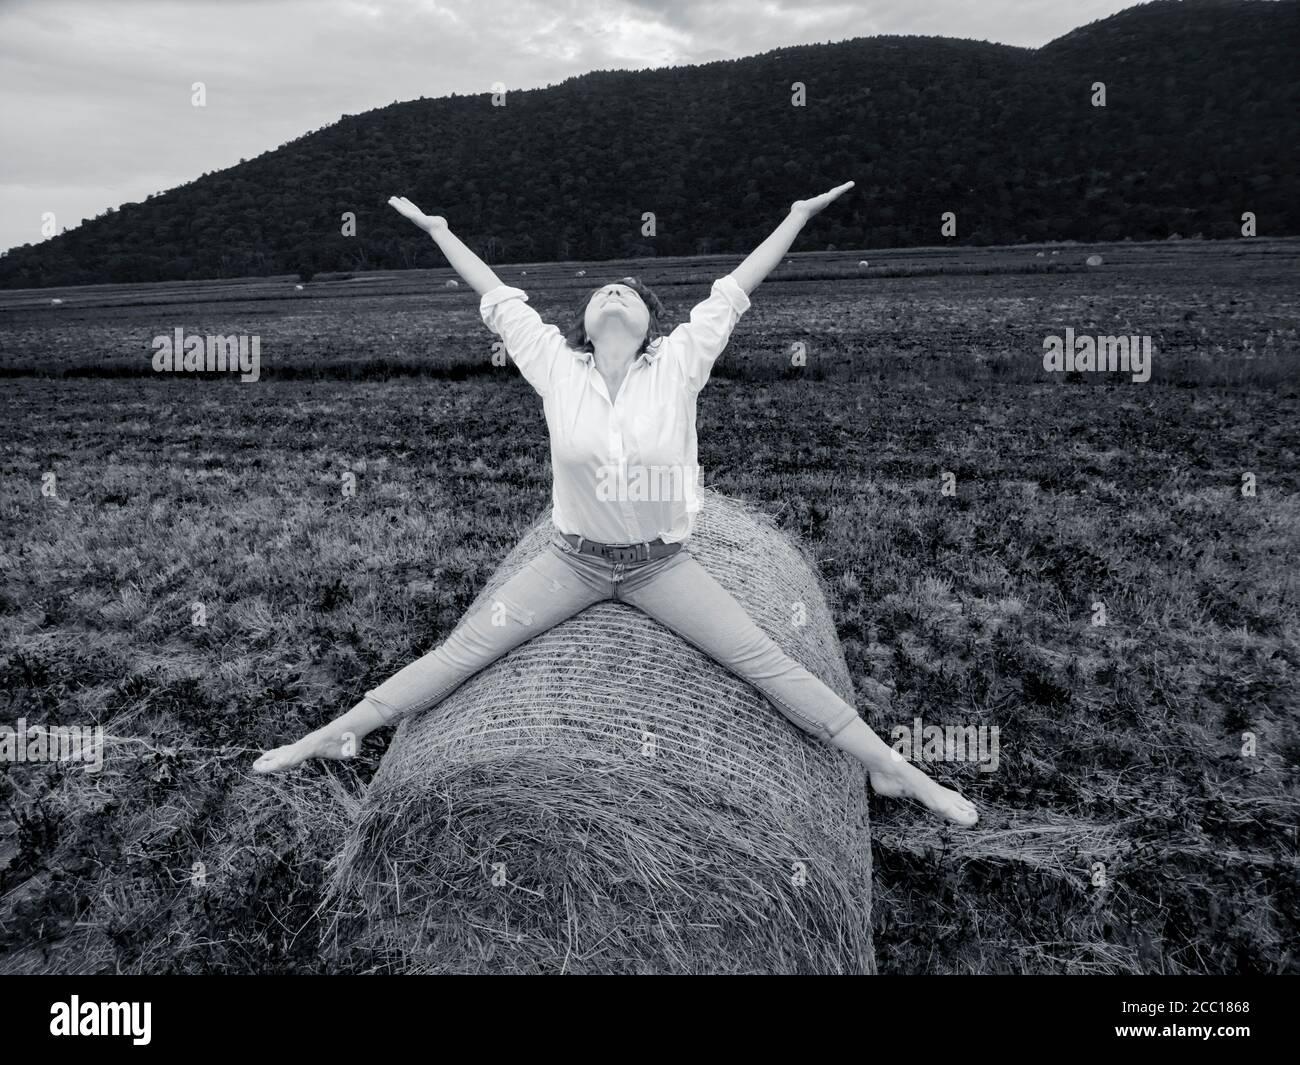 Woman riding hay haystack in retro monochrome b&w Black and White Stock Photo